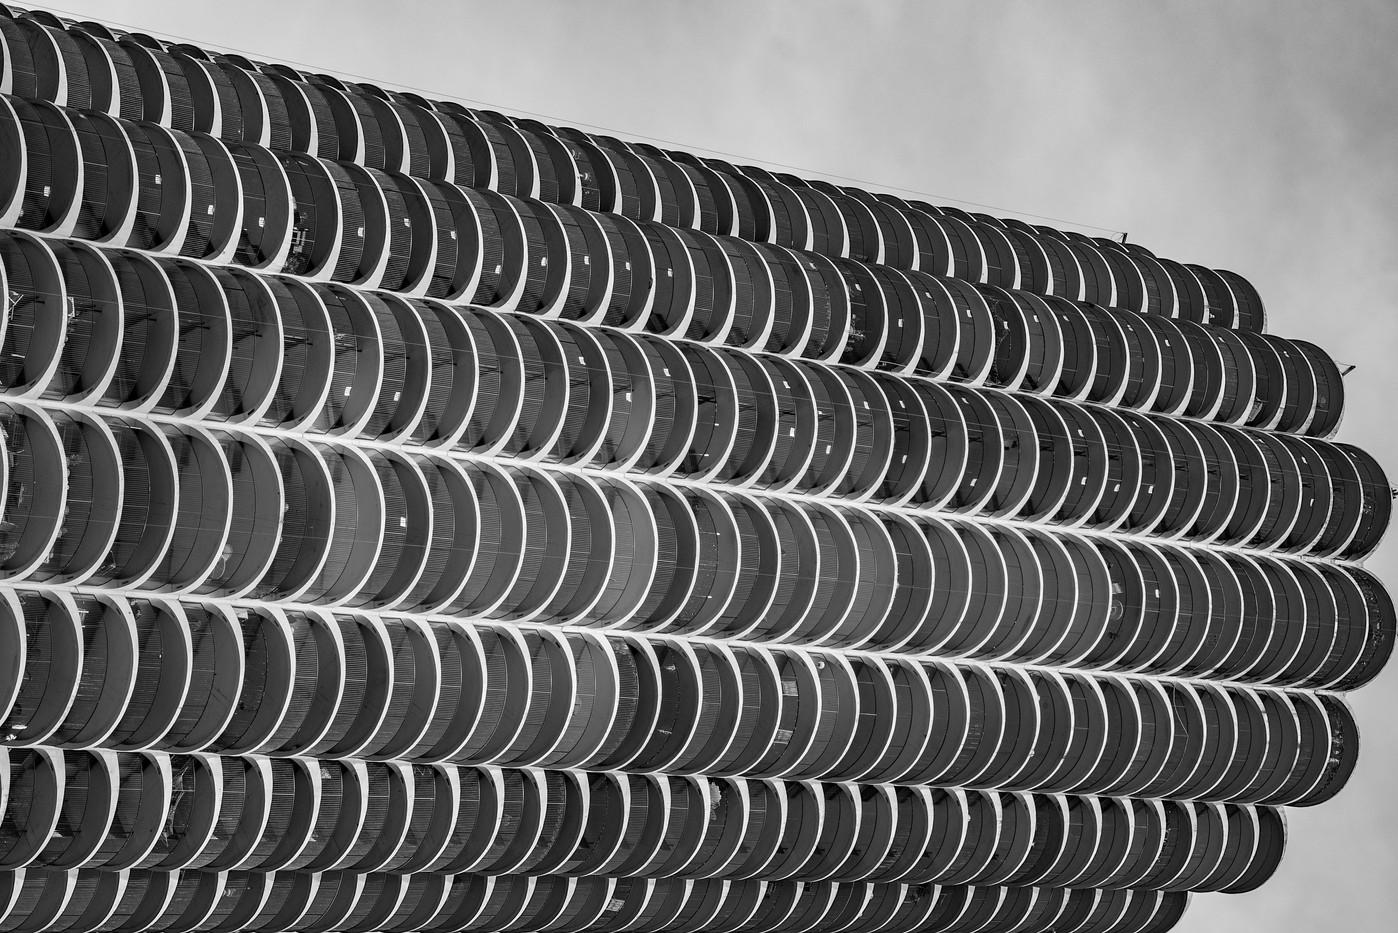 Archistructures #6